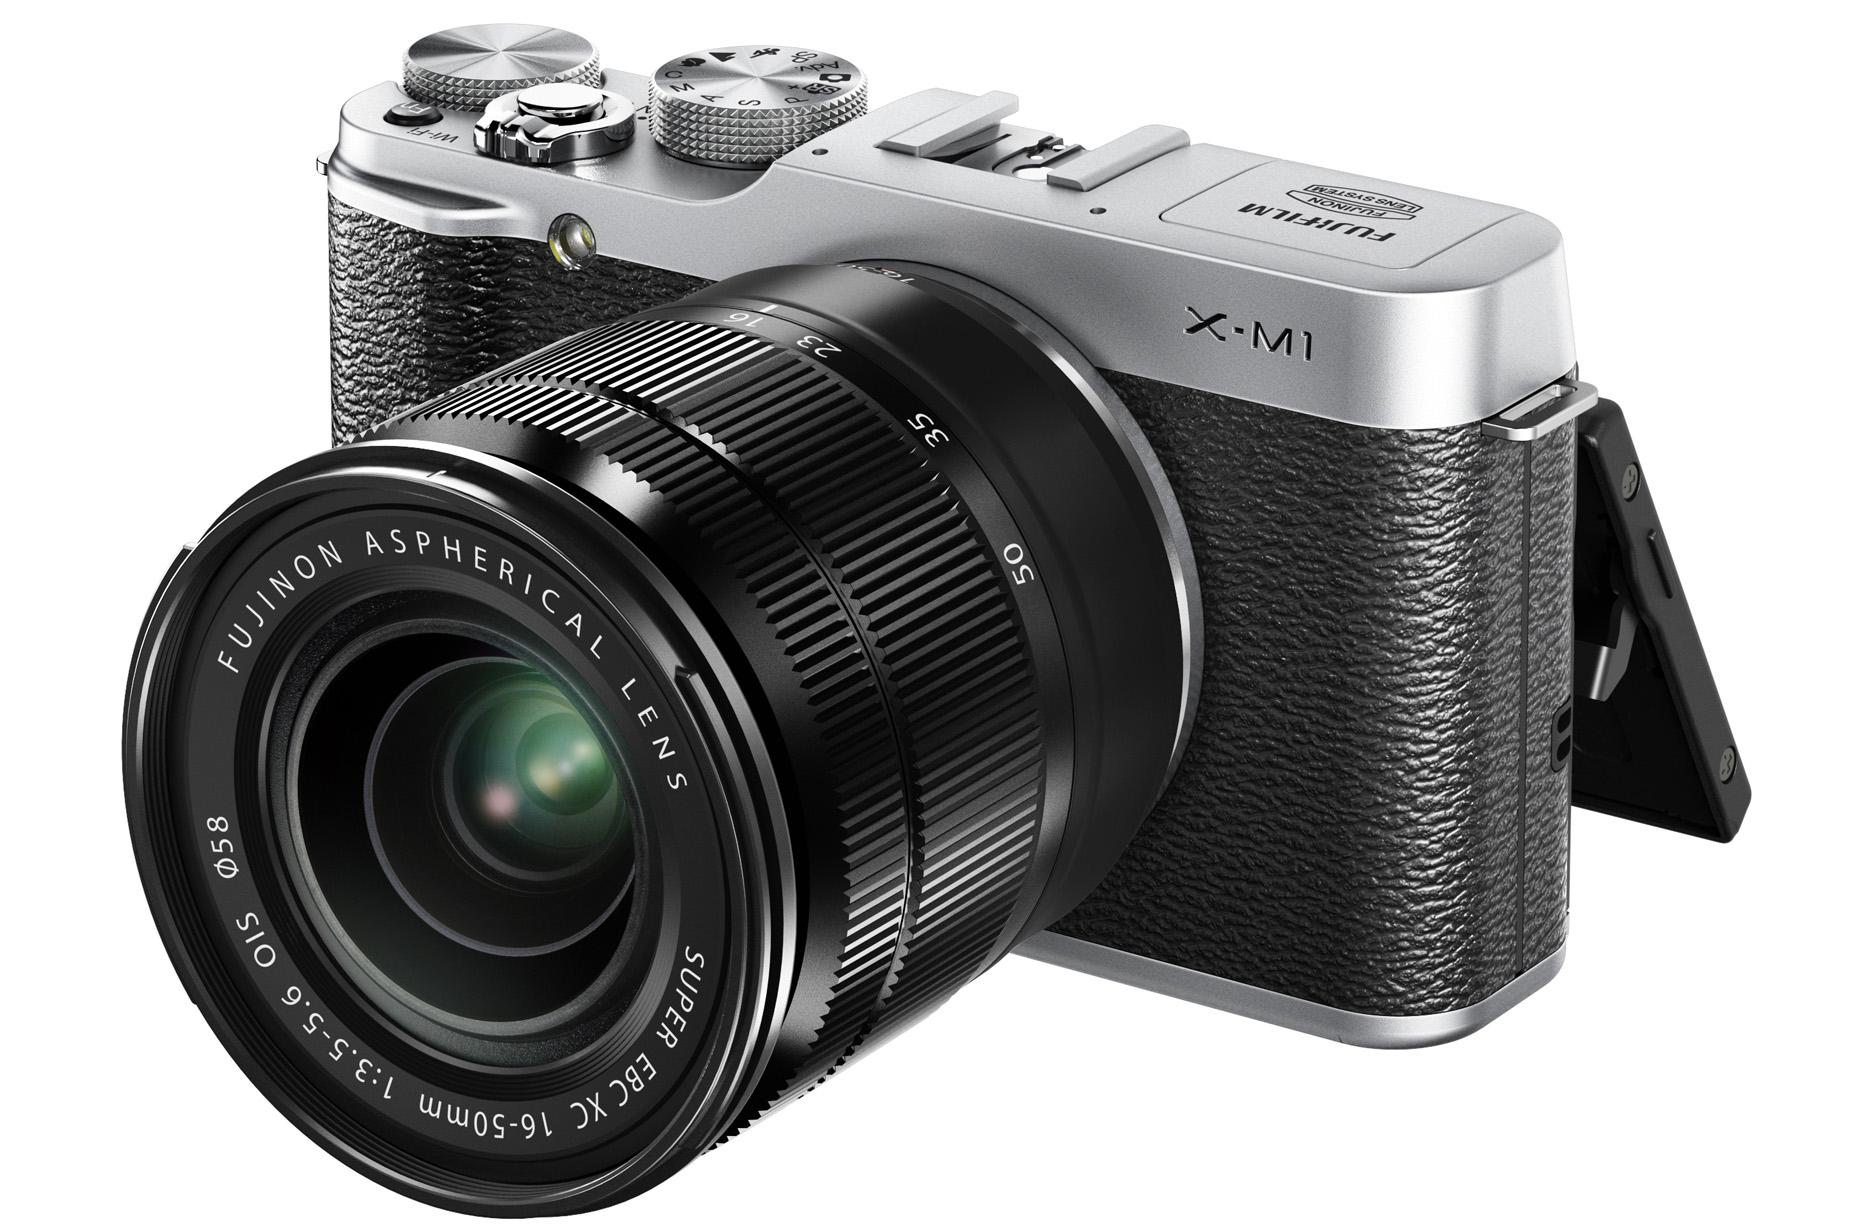 399 Fuji X M1 Ec Mall Product Digital Camera Fujifilm 39837